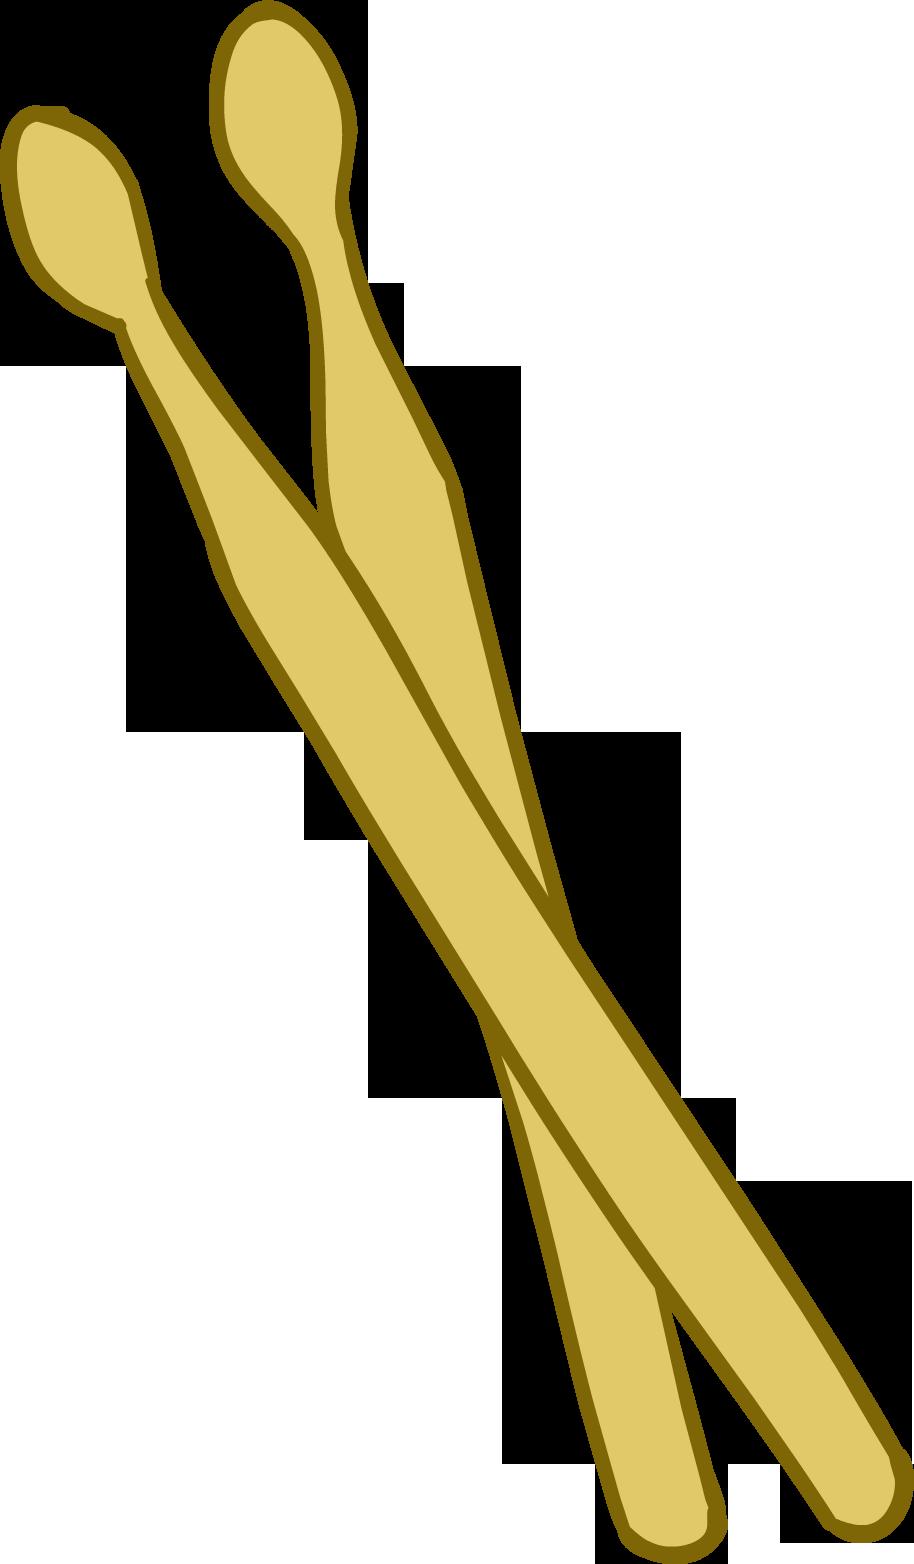 Drum Sticks PNG - 982